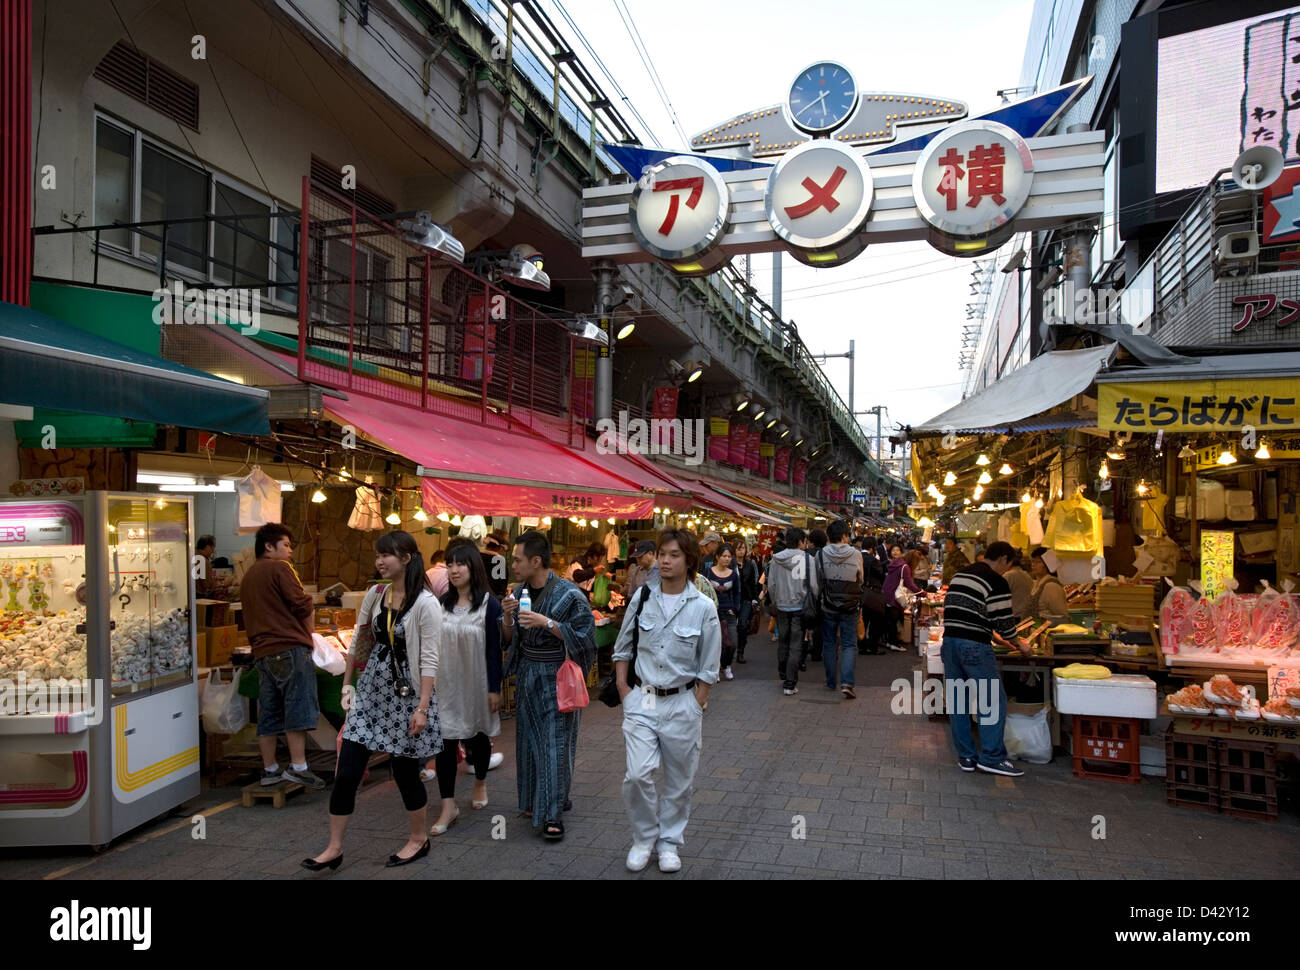 Ameyoko-cho, former black market under railway in Okachimachi Tokyo, is a thriving food and merchandise marketplace - Stock Image